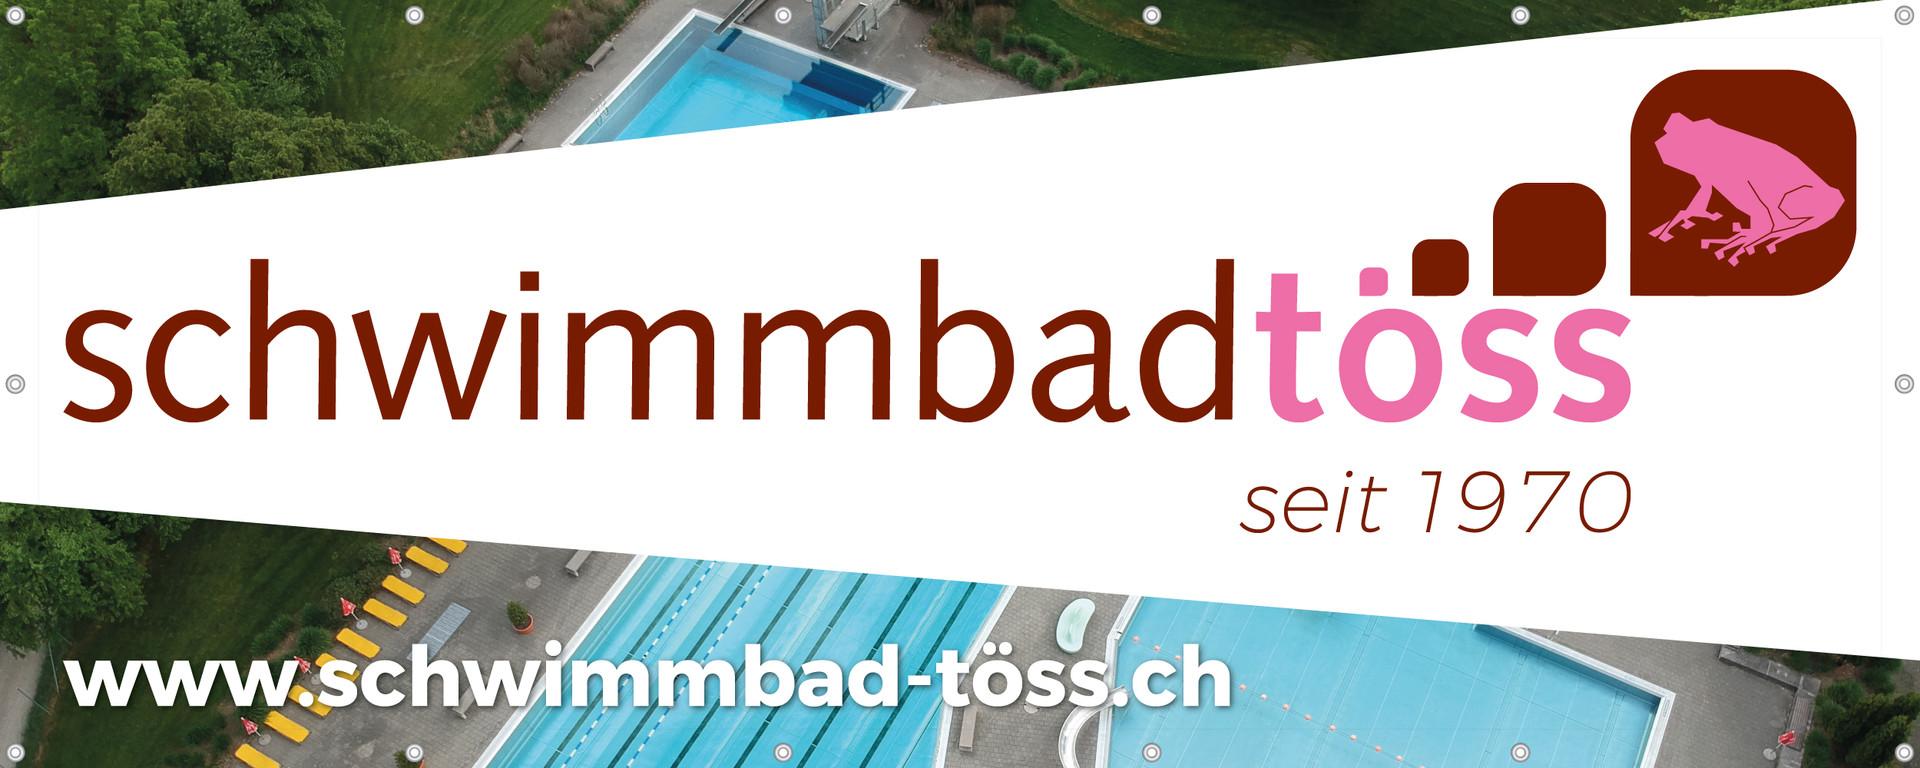 Blachen-Schwimmbad-Toess-1.jpg